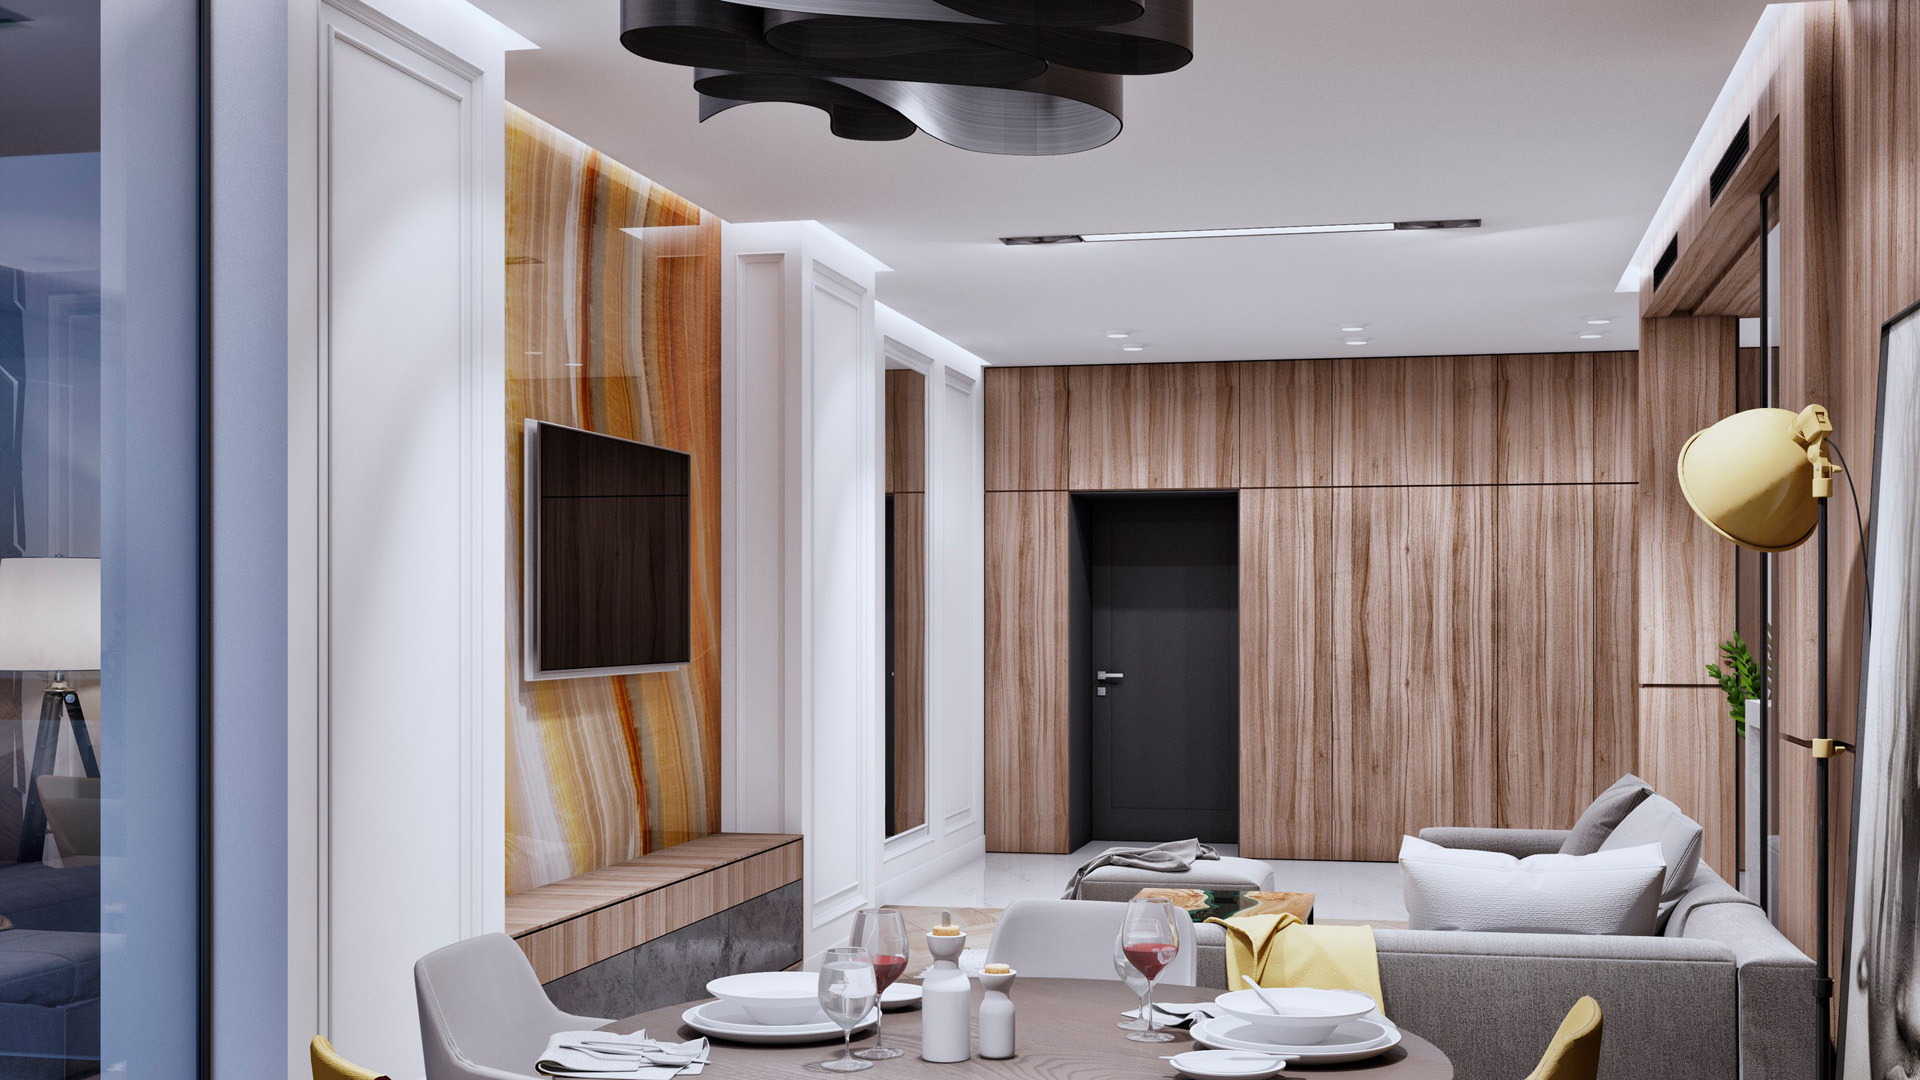 Interior design two-bedroom apartment